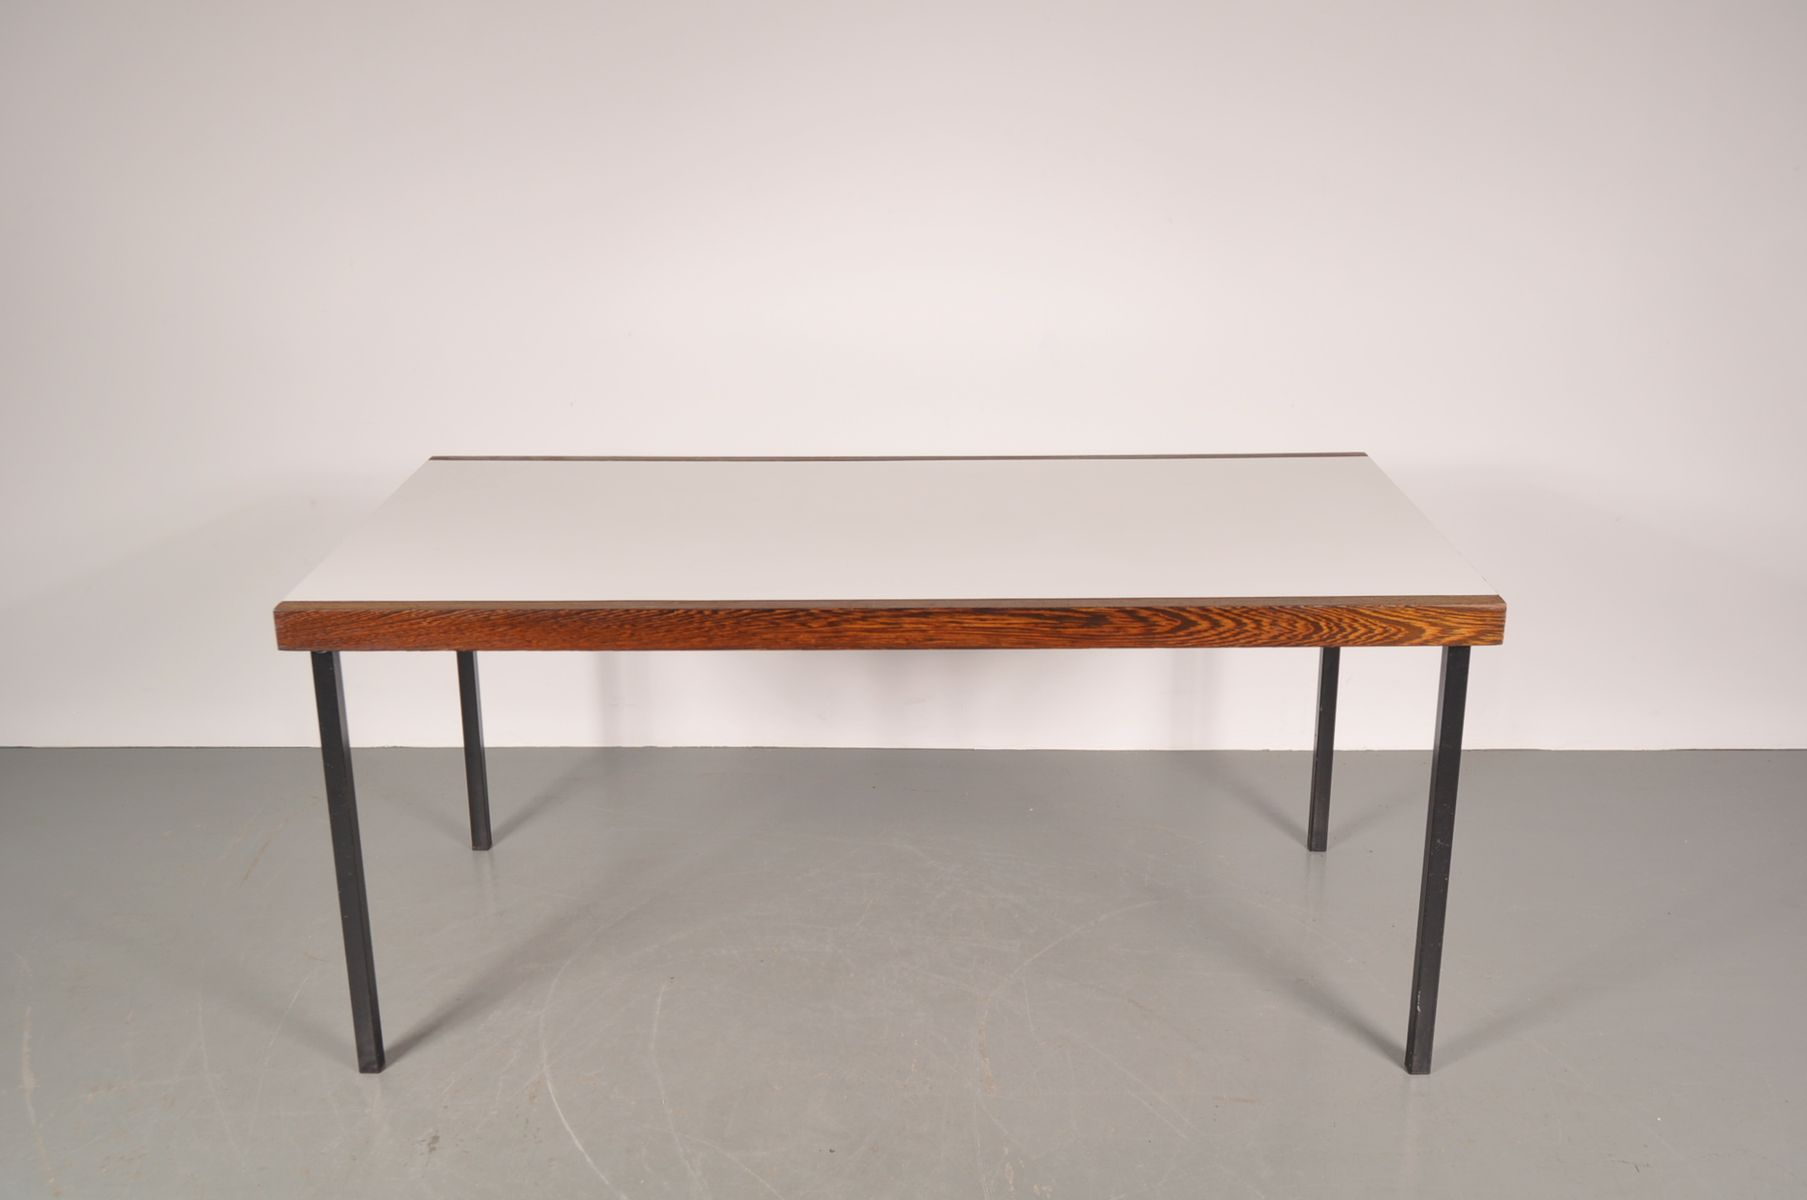 Table de salle manger blanche en weng avec base en for Table de salle a manger couleur wenge